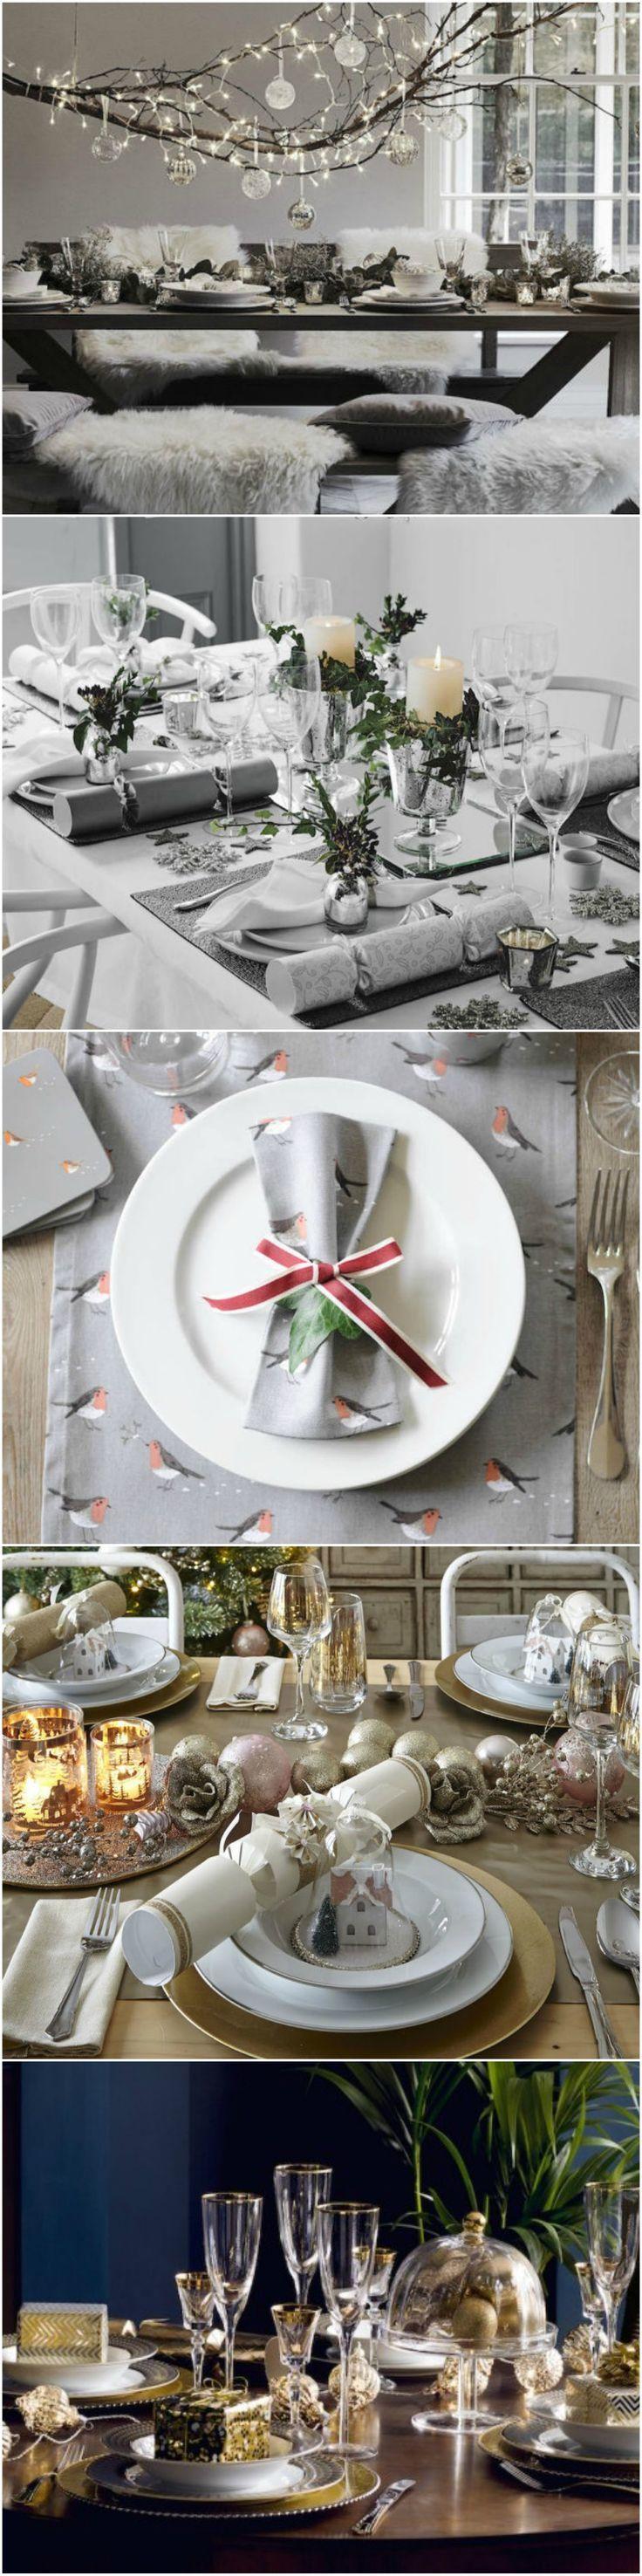 Christmas inspiration: 8 gorgeous table setting ideas